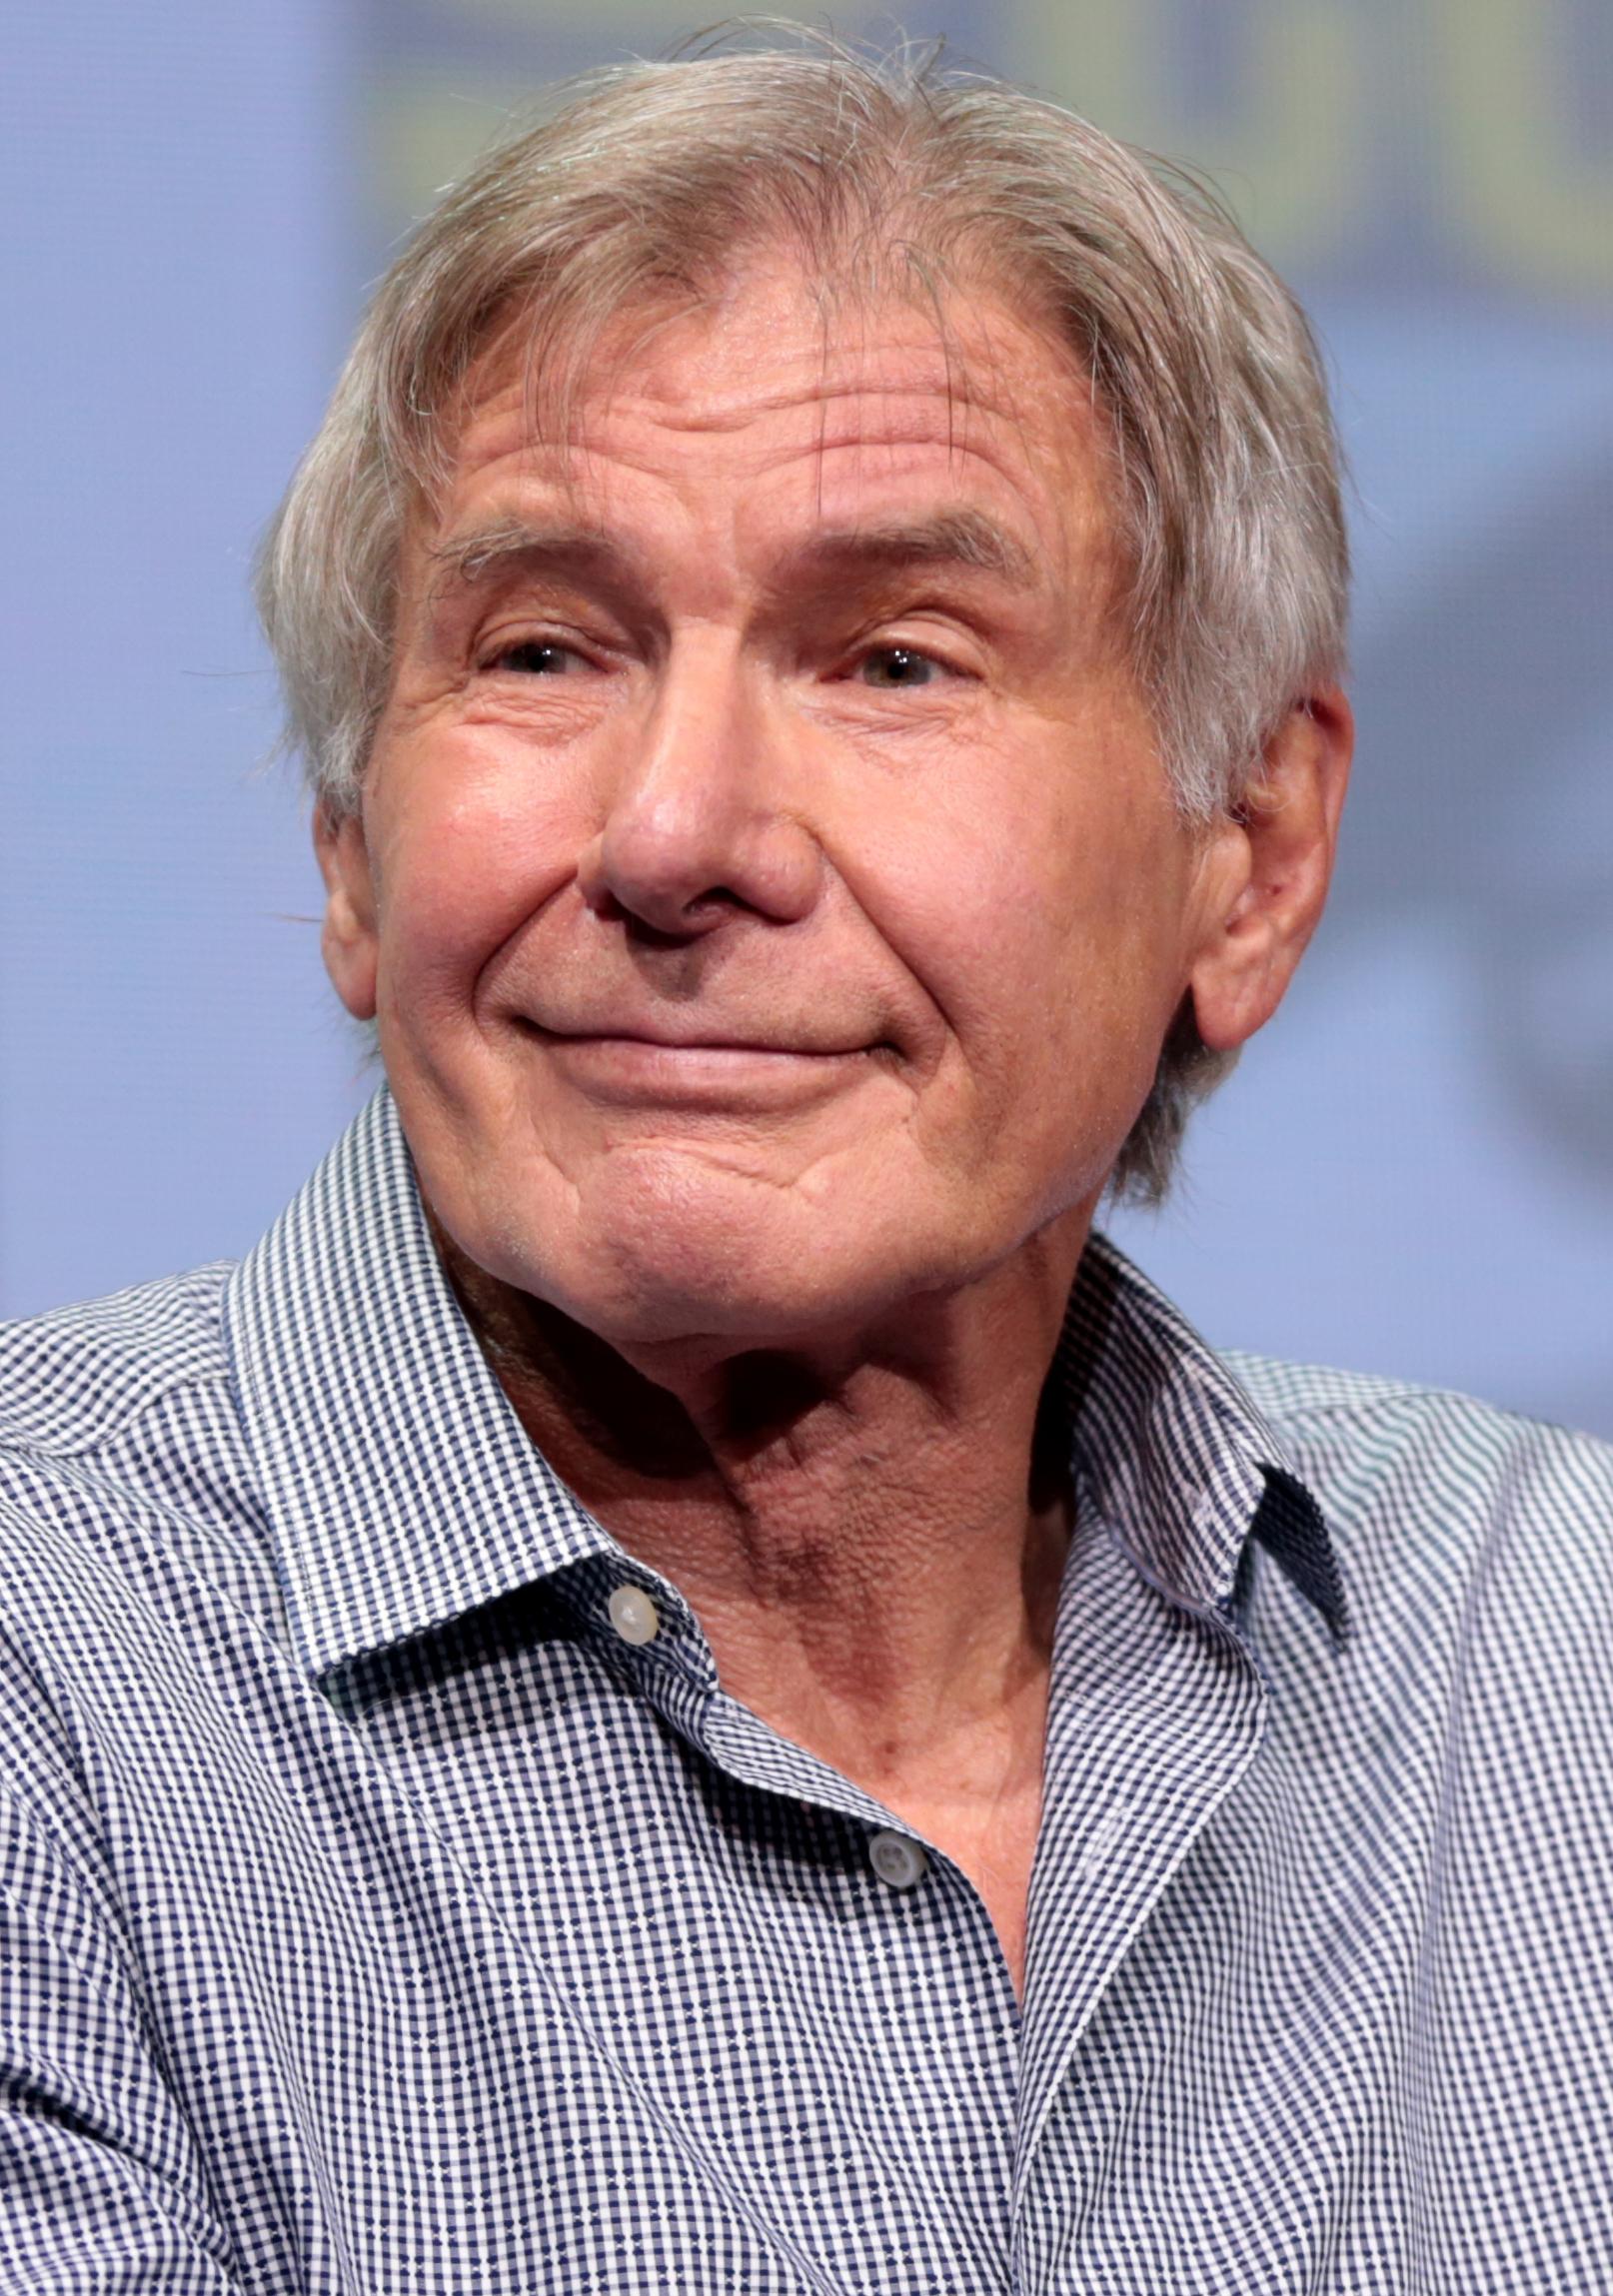 Harrison Ford - Simple English Wikipedia, the free encyclopedia